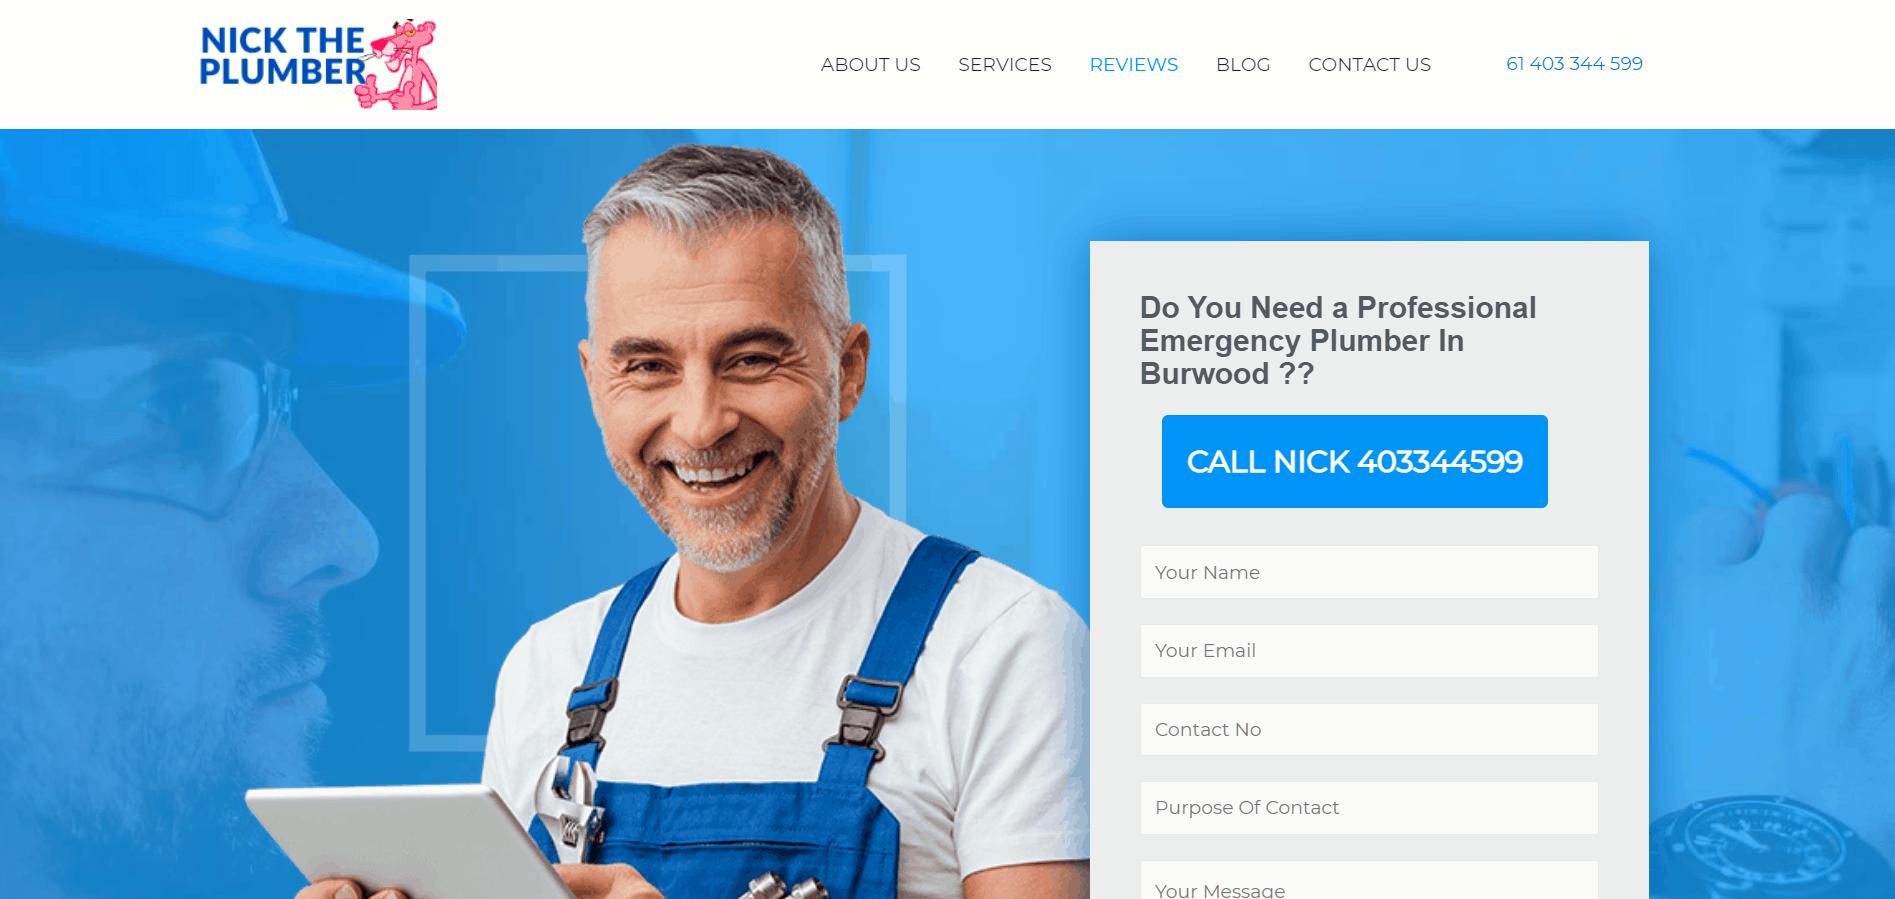 Nick The Plumber